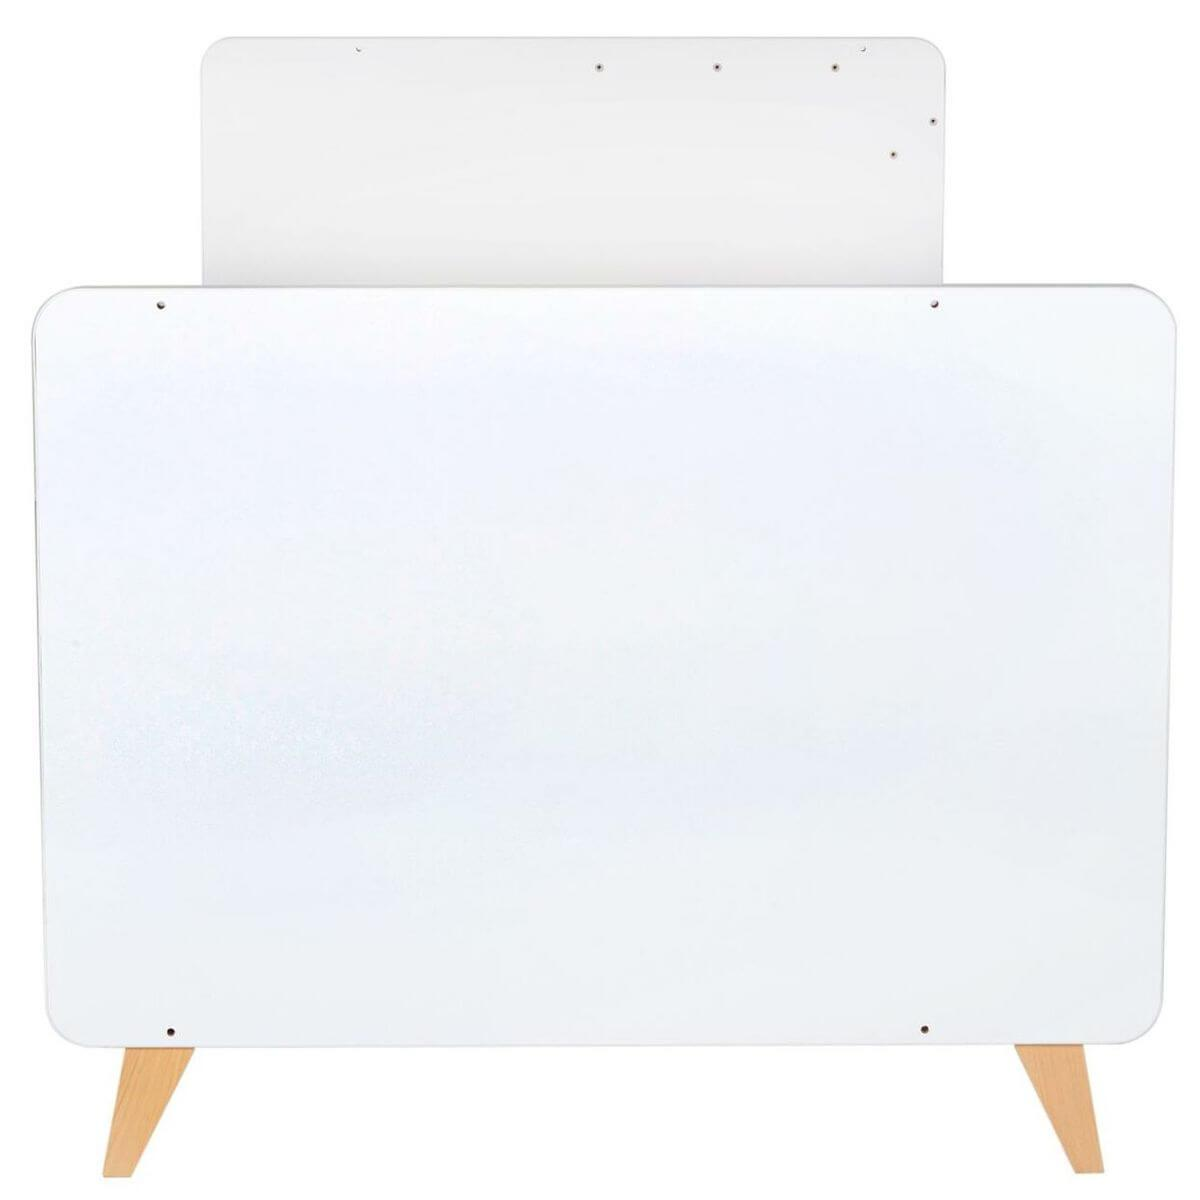 Cuna-Cama 60x120/90x200cm LOFT Quax blanco